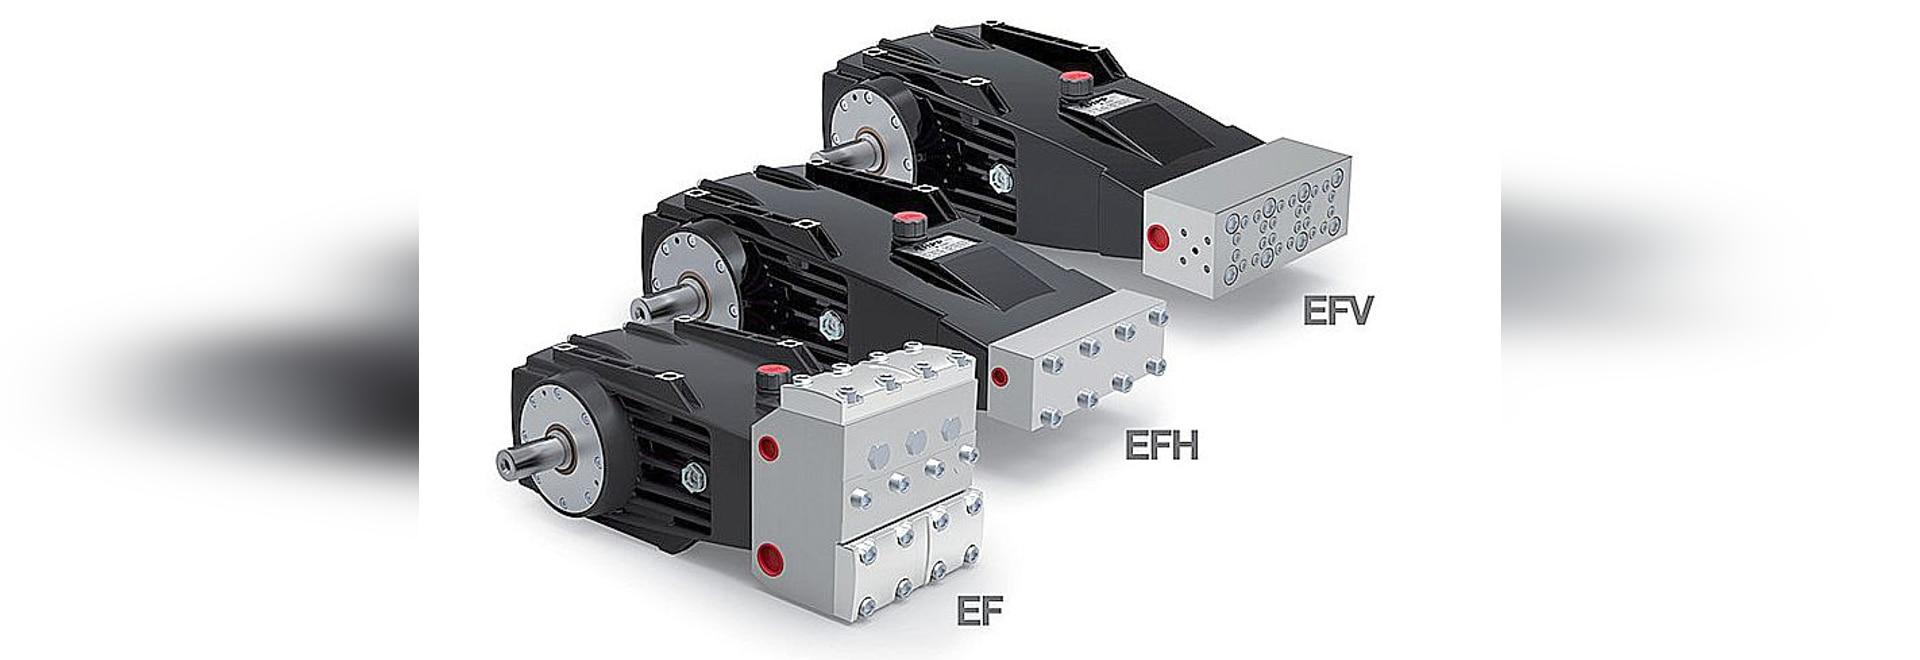 EF Series - HPP New High Pressure Plunger Pumps